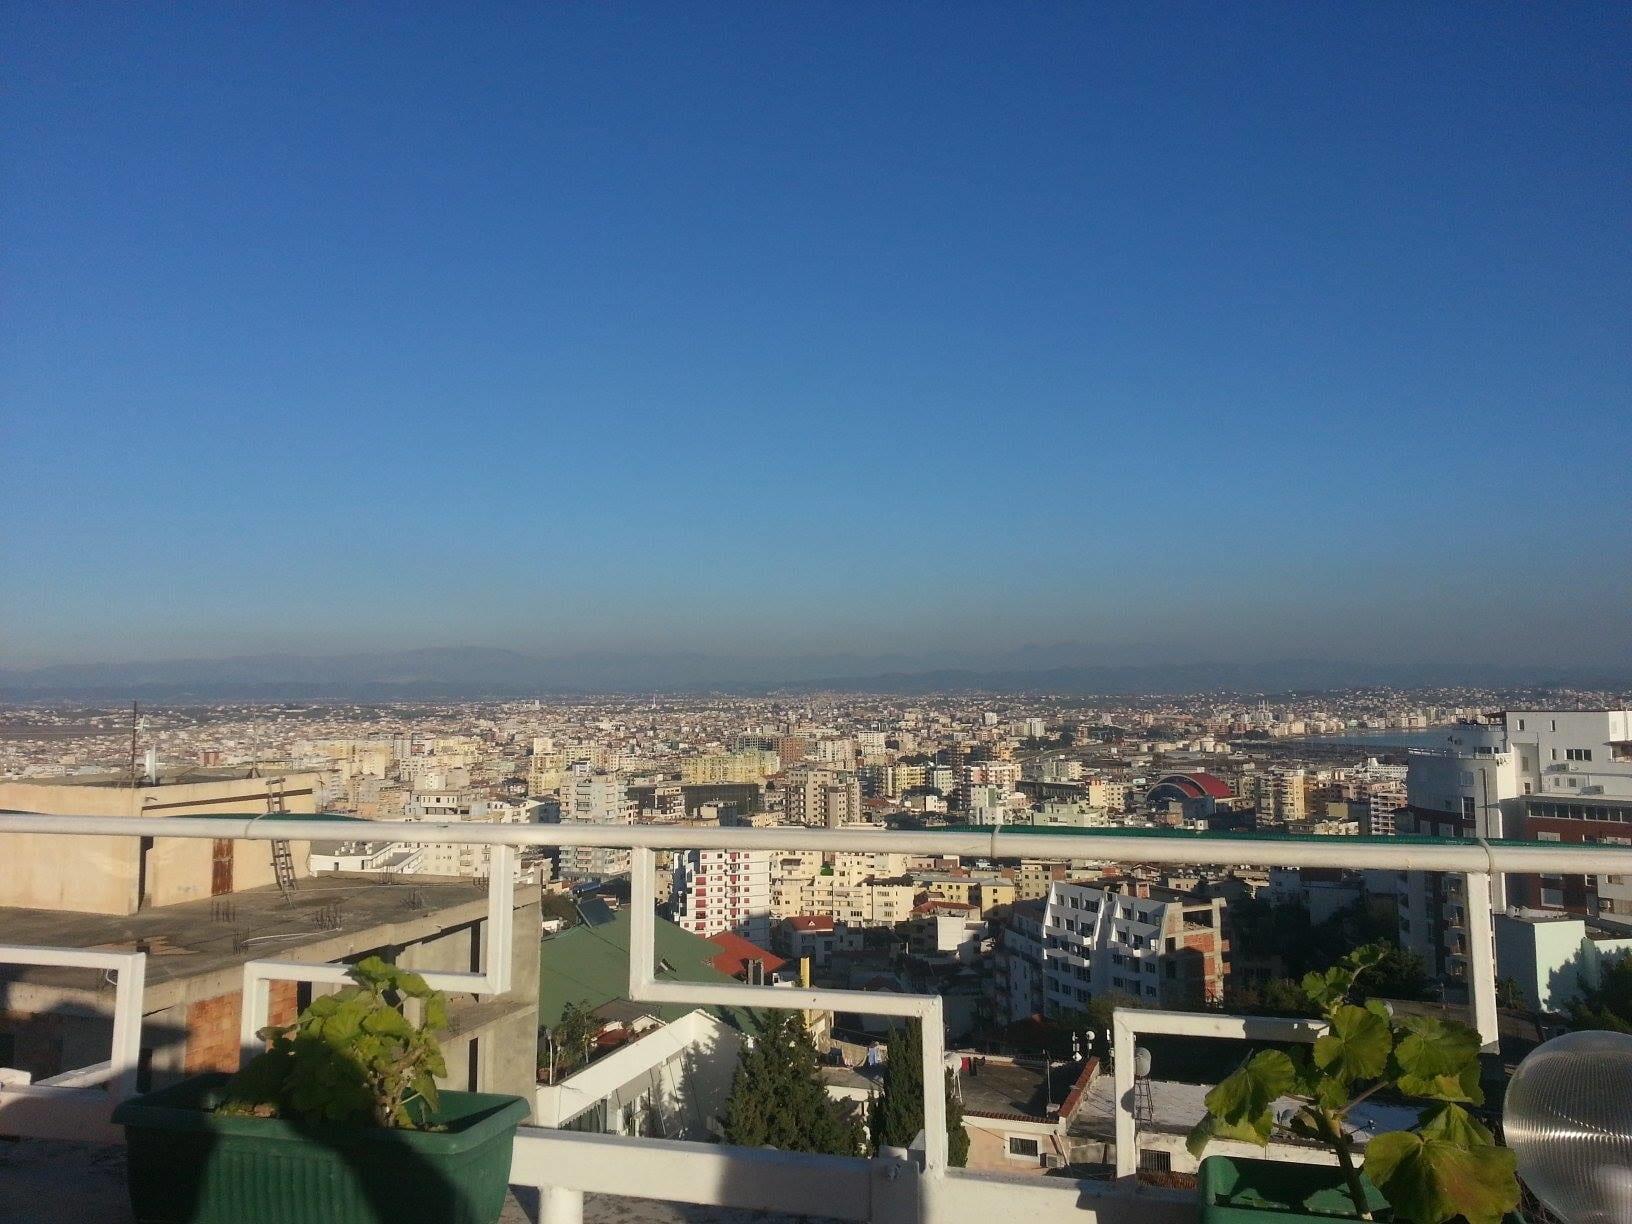 Cityscape of Durres